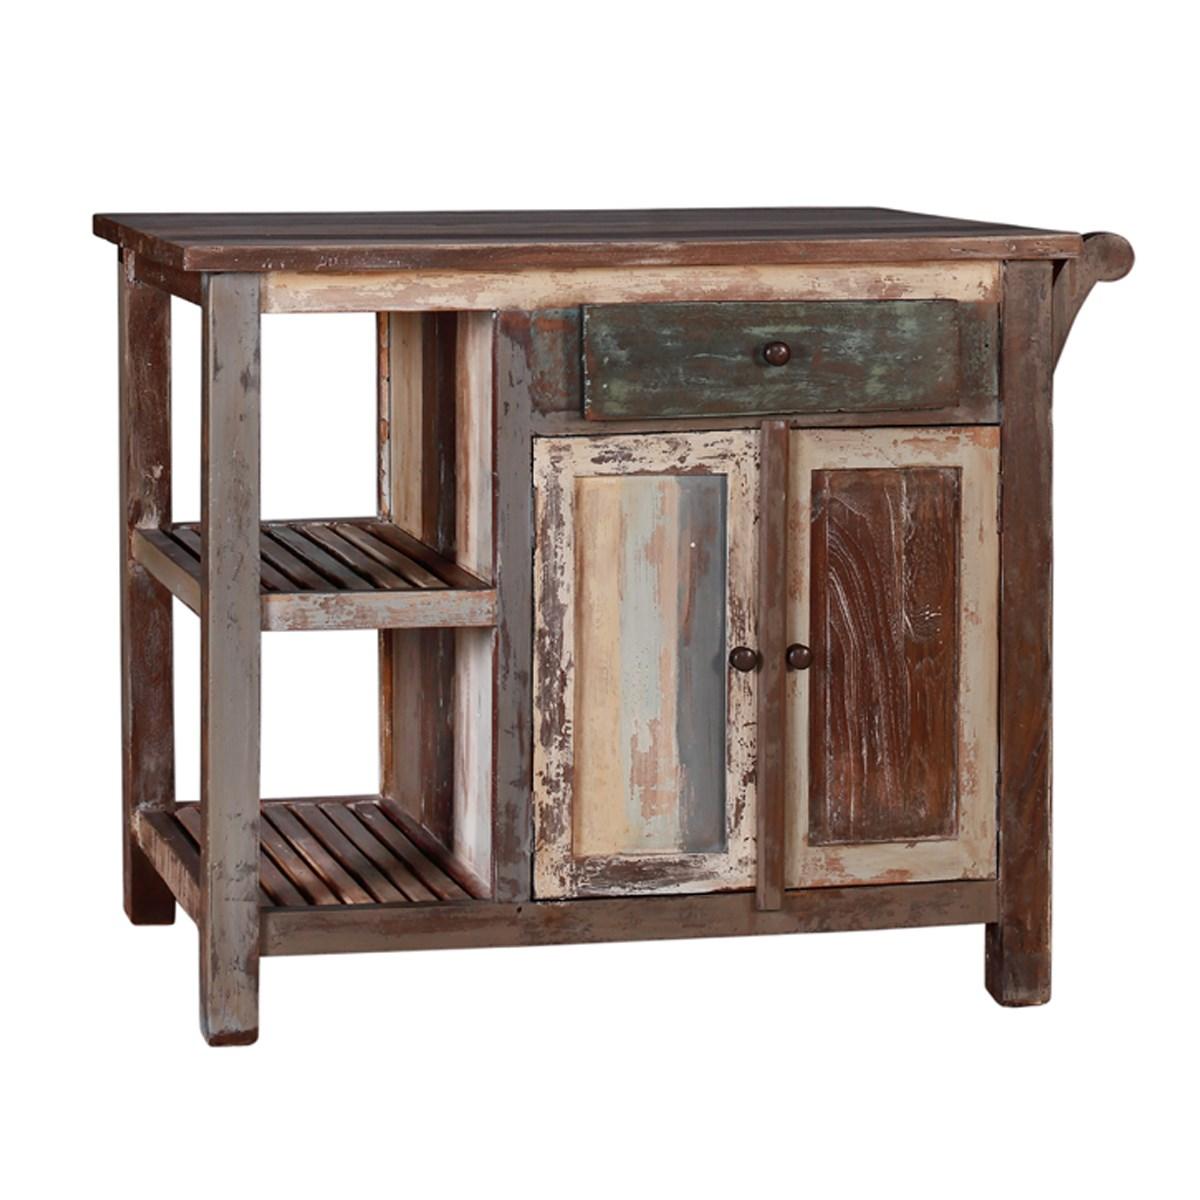 Beyond Borders Furniture Co.